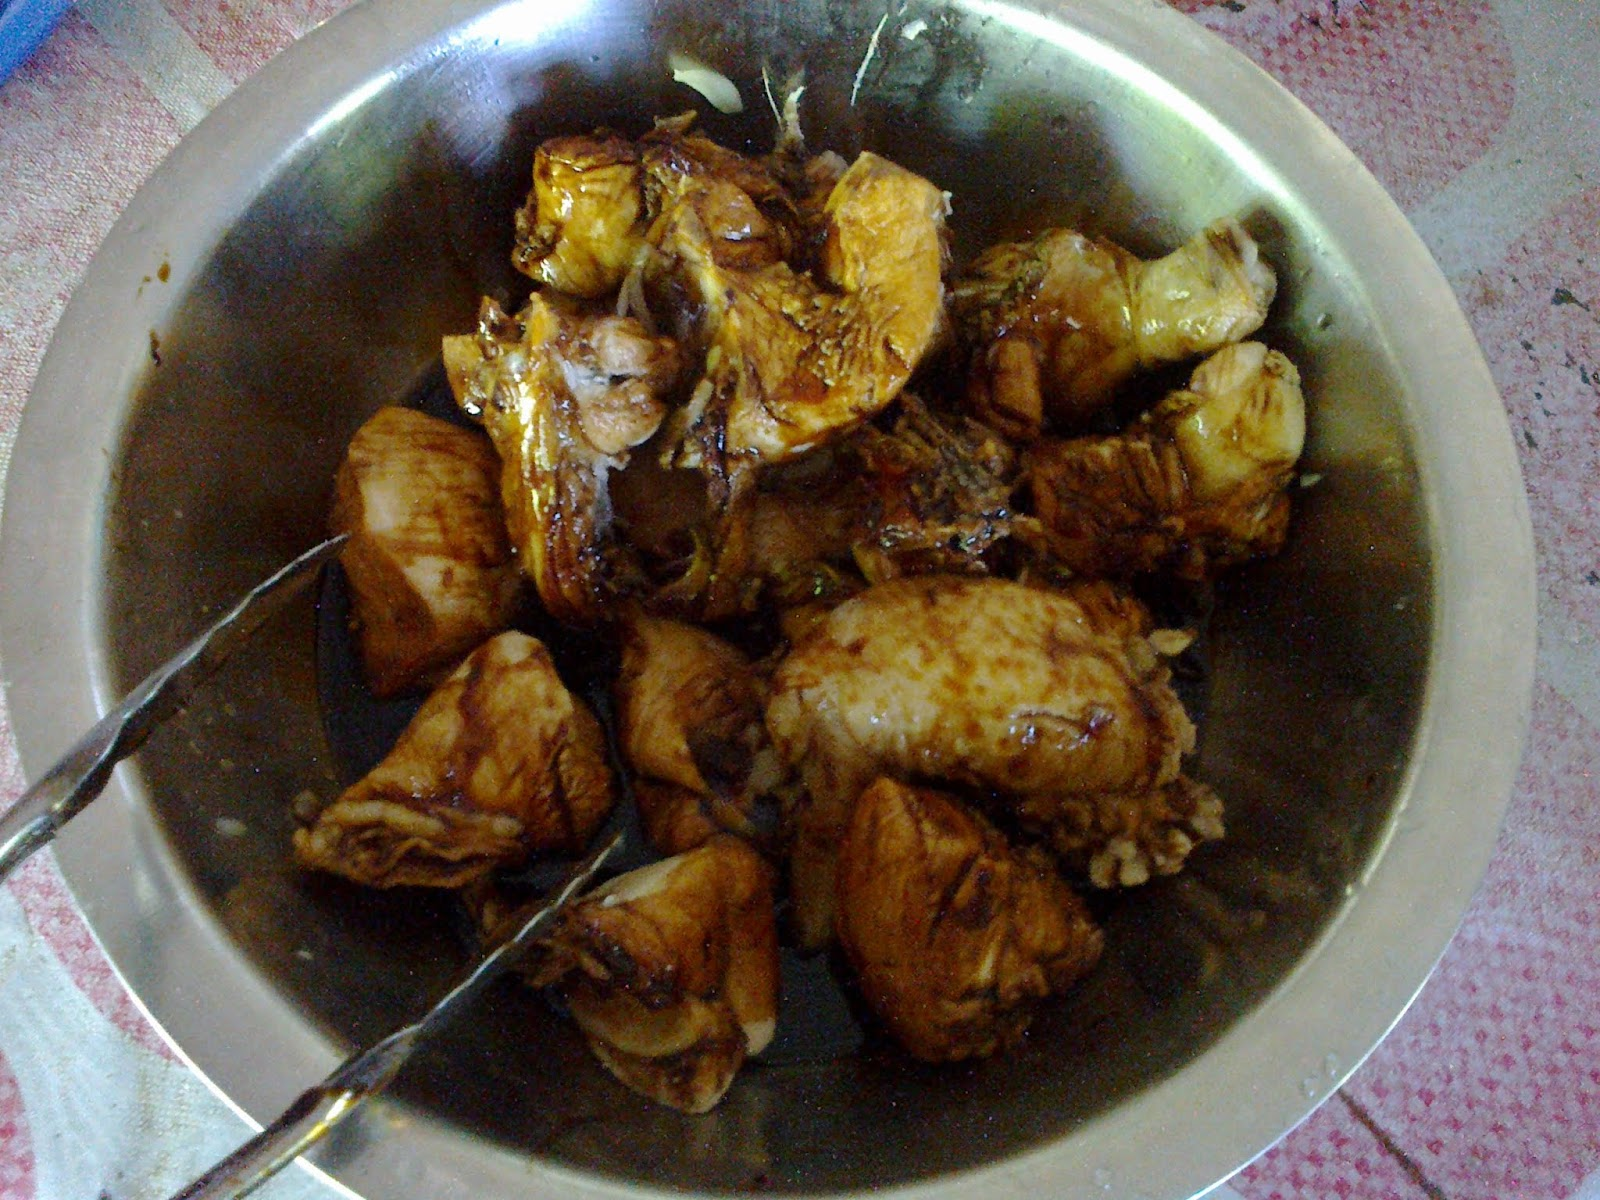 resepi ayam elly quotes Resepi Daging Masak Kicap Madu Enak dan Mudah